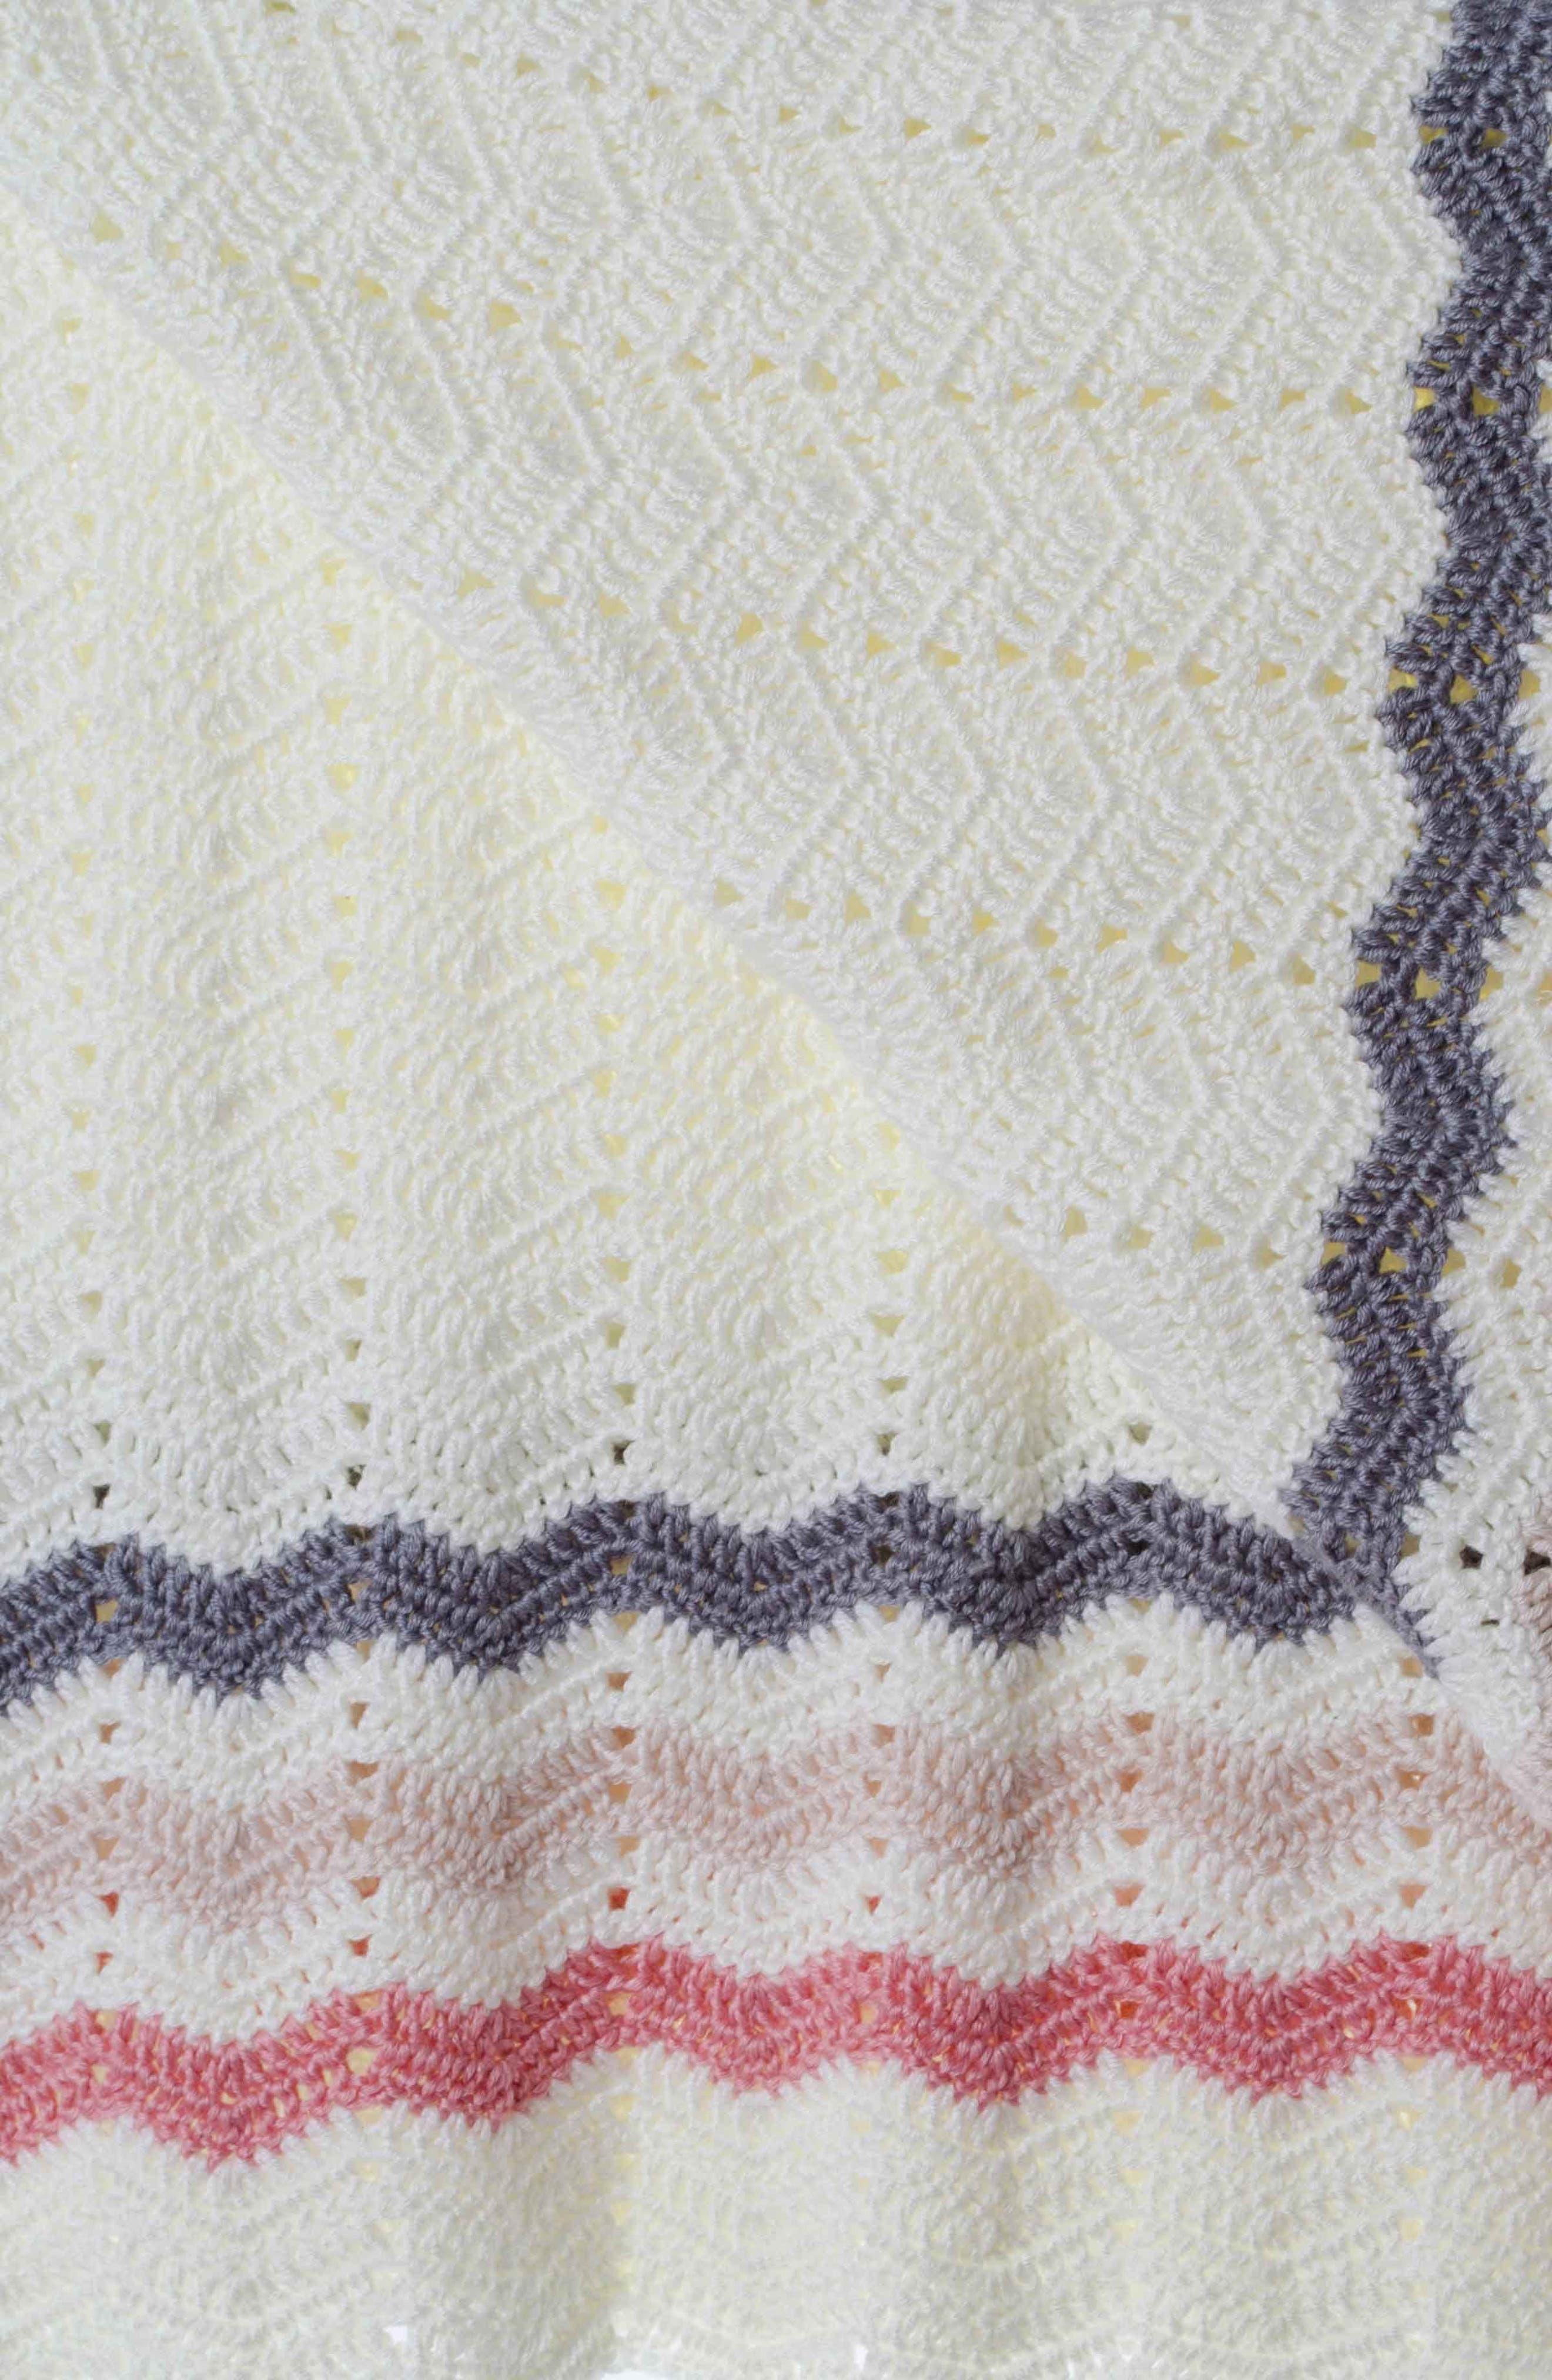 Ripple Crocheted Blanket,                             Alternate thumbnail 2, color,                             PINK